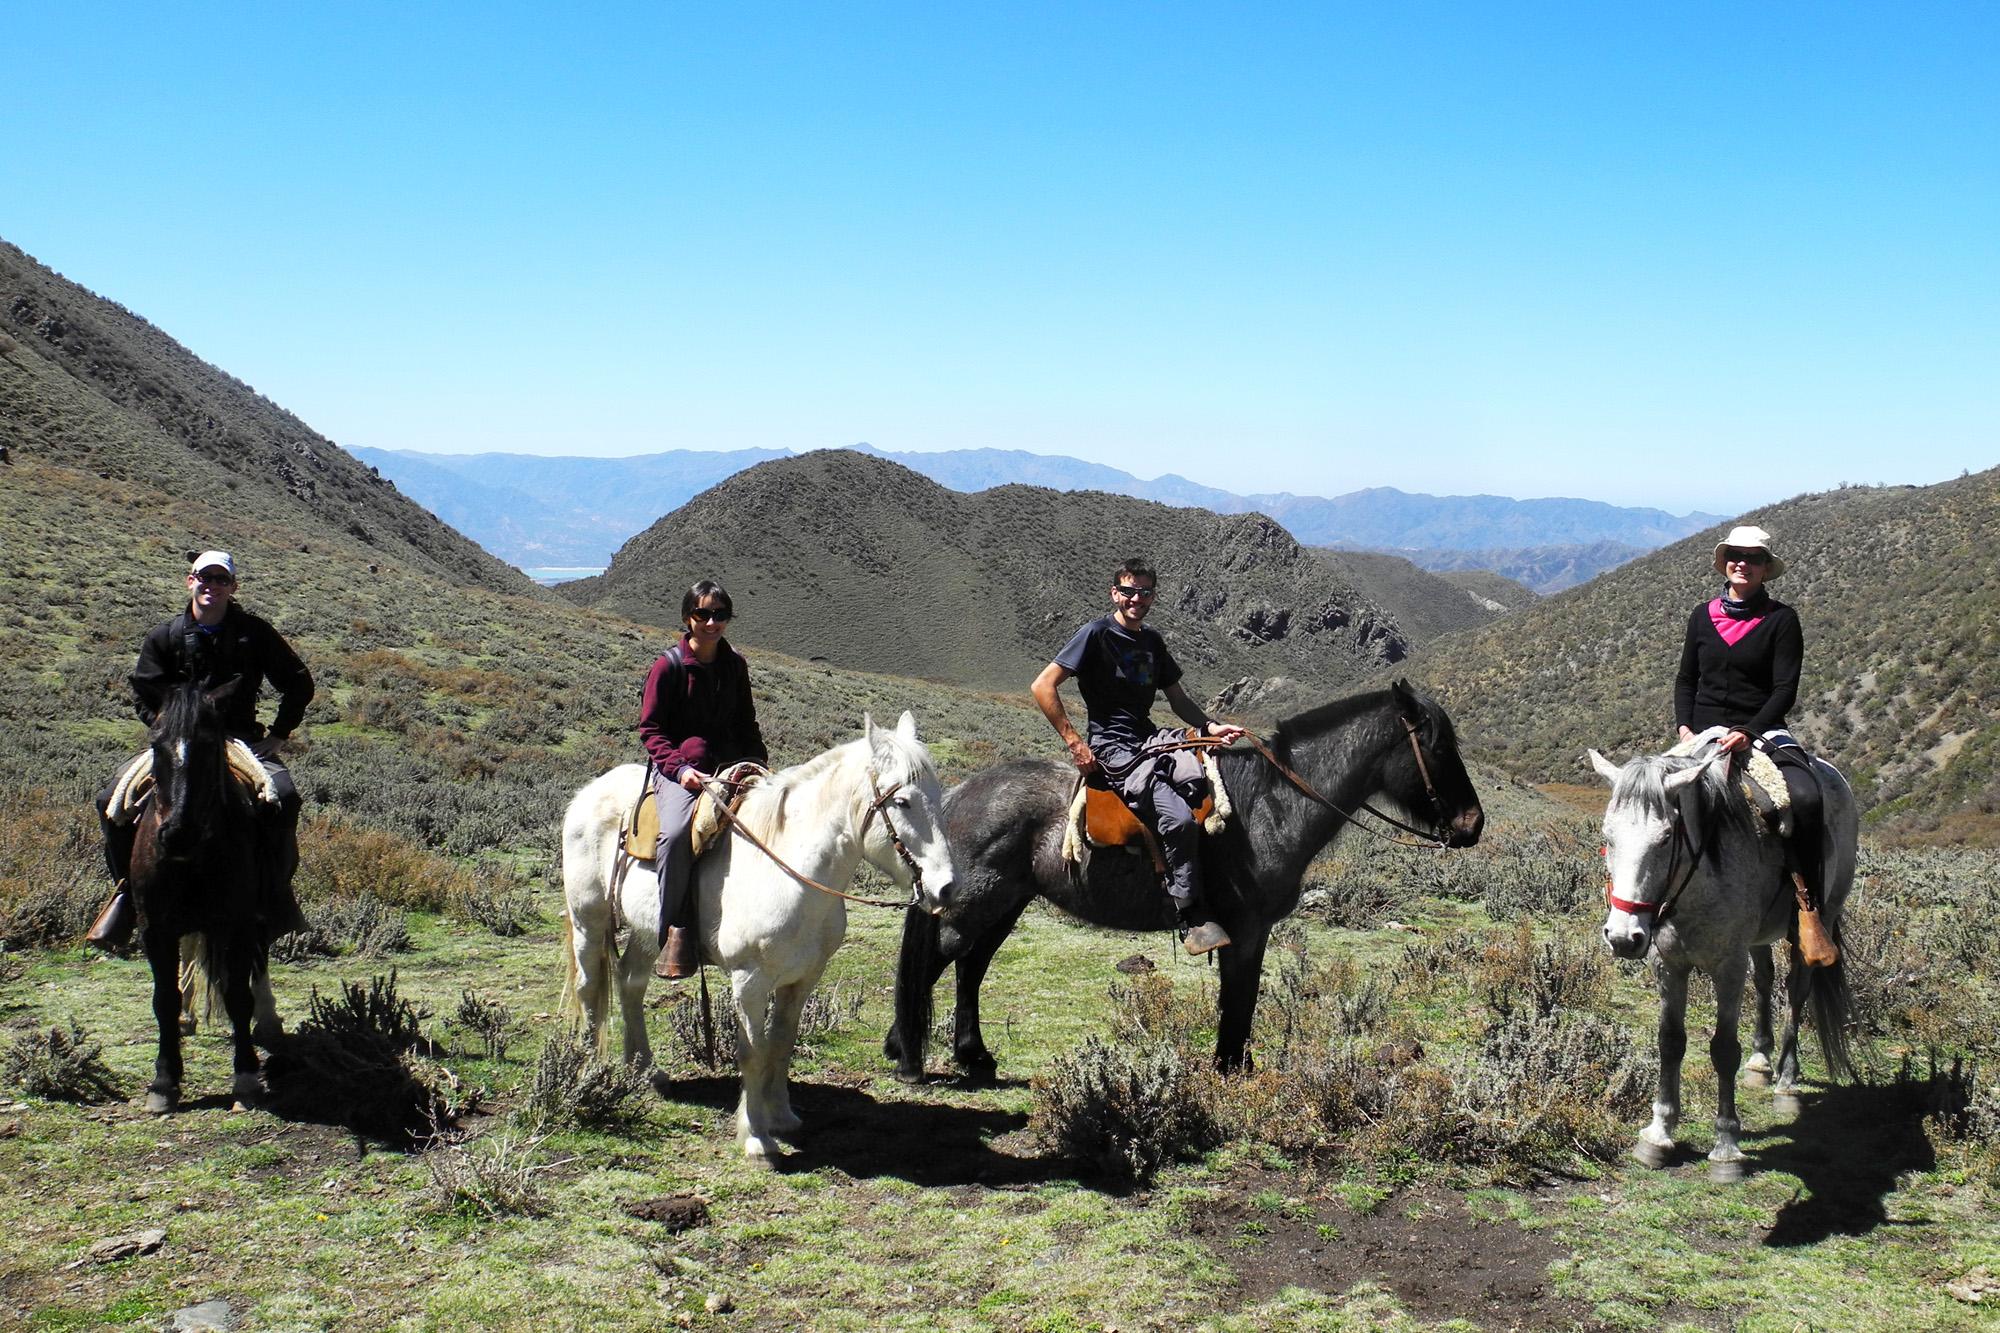 wine-TROTTERS_oenotourisme_wine-tourism-agency_tour_vino_vin_turismo_ARGENTINA_Mendoza_trekking_hiking_horseback-riding_alta-montana_Andes_106_WEB-2000px.jpg